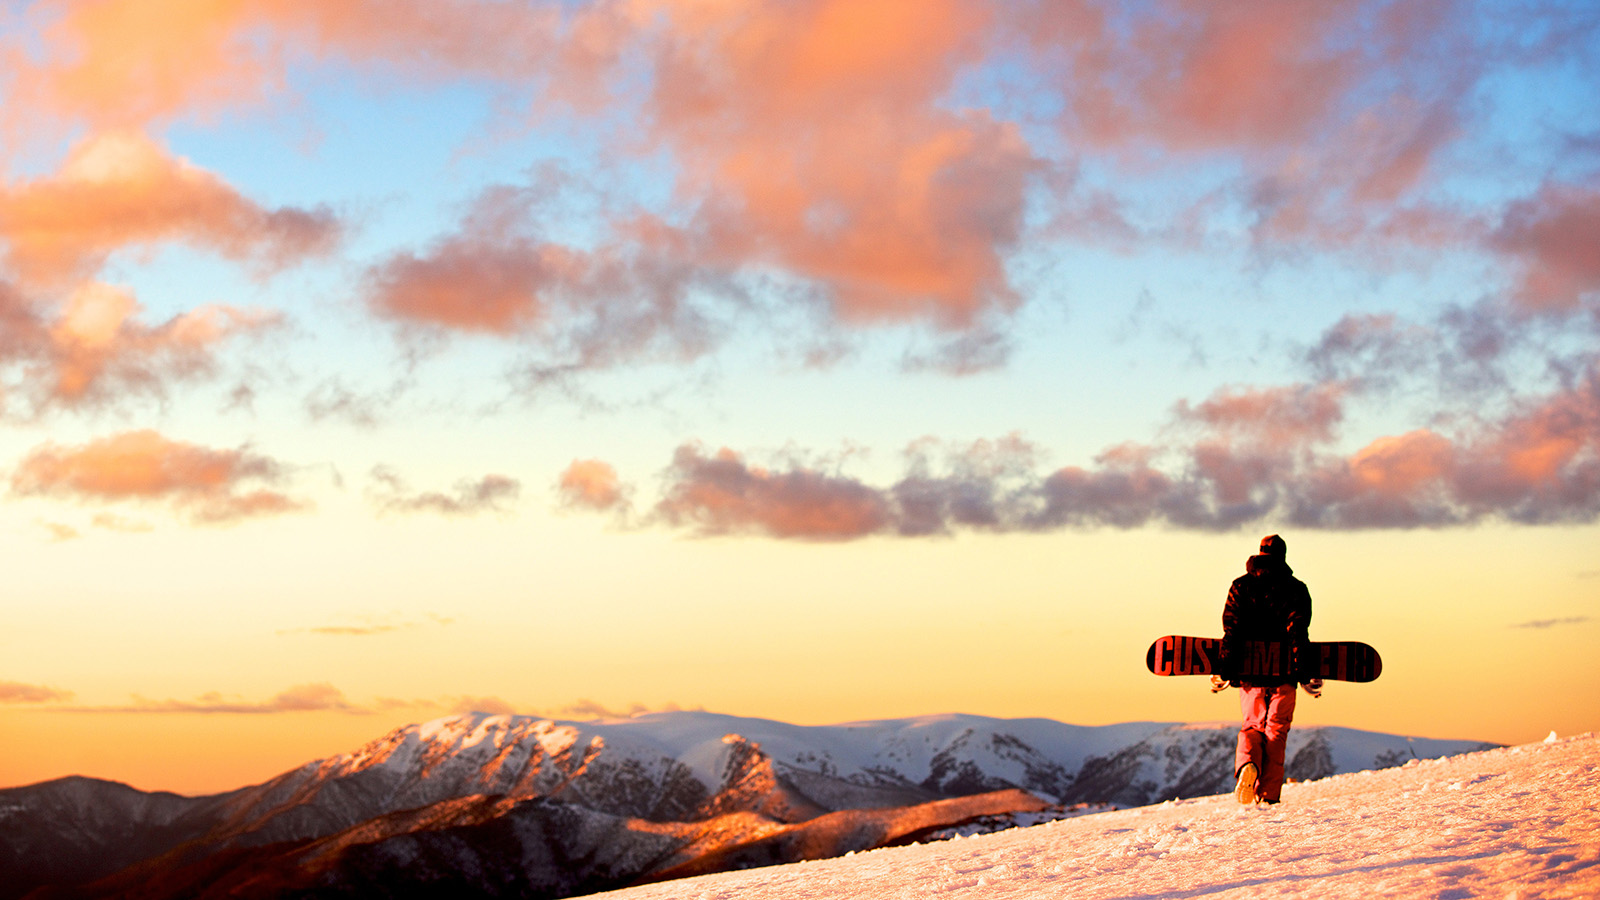 Snowboarder at Falls Creek, High Country, Victoria, Australia